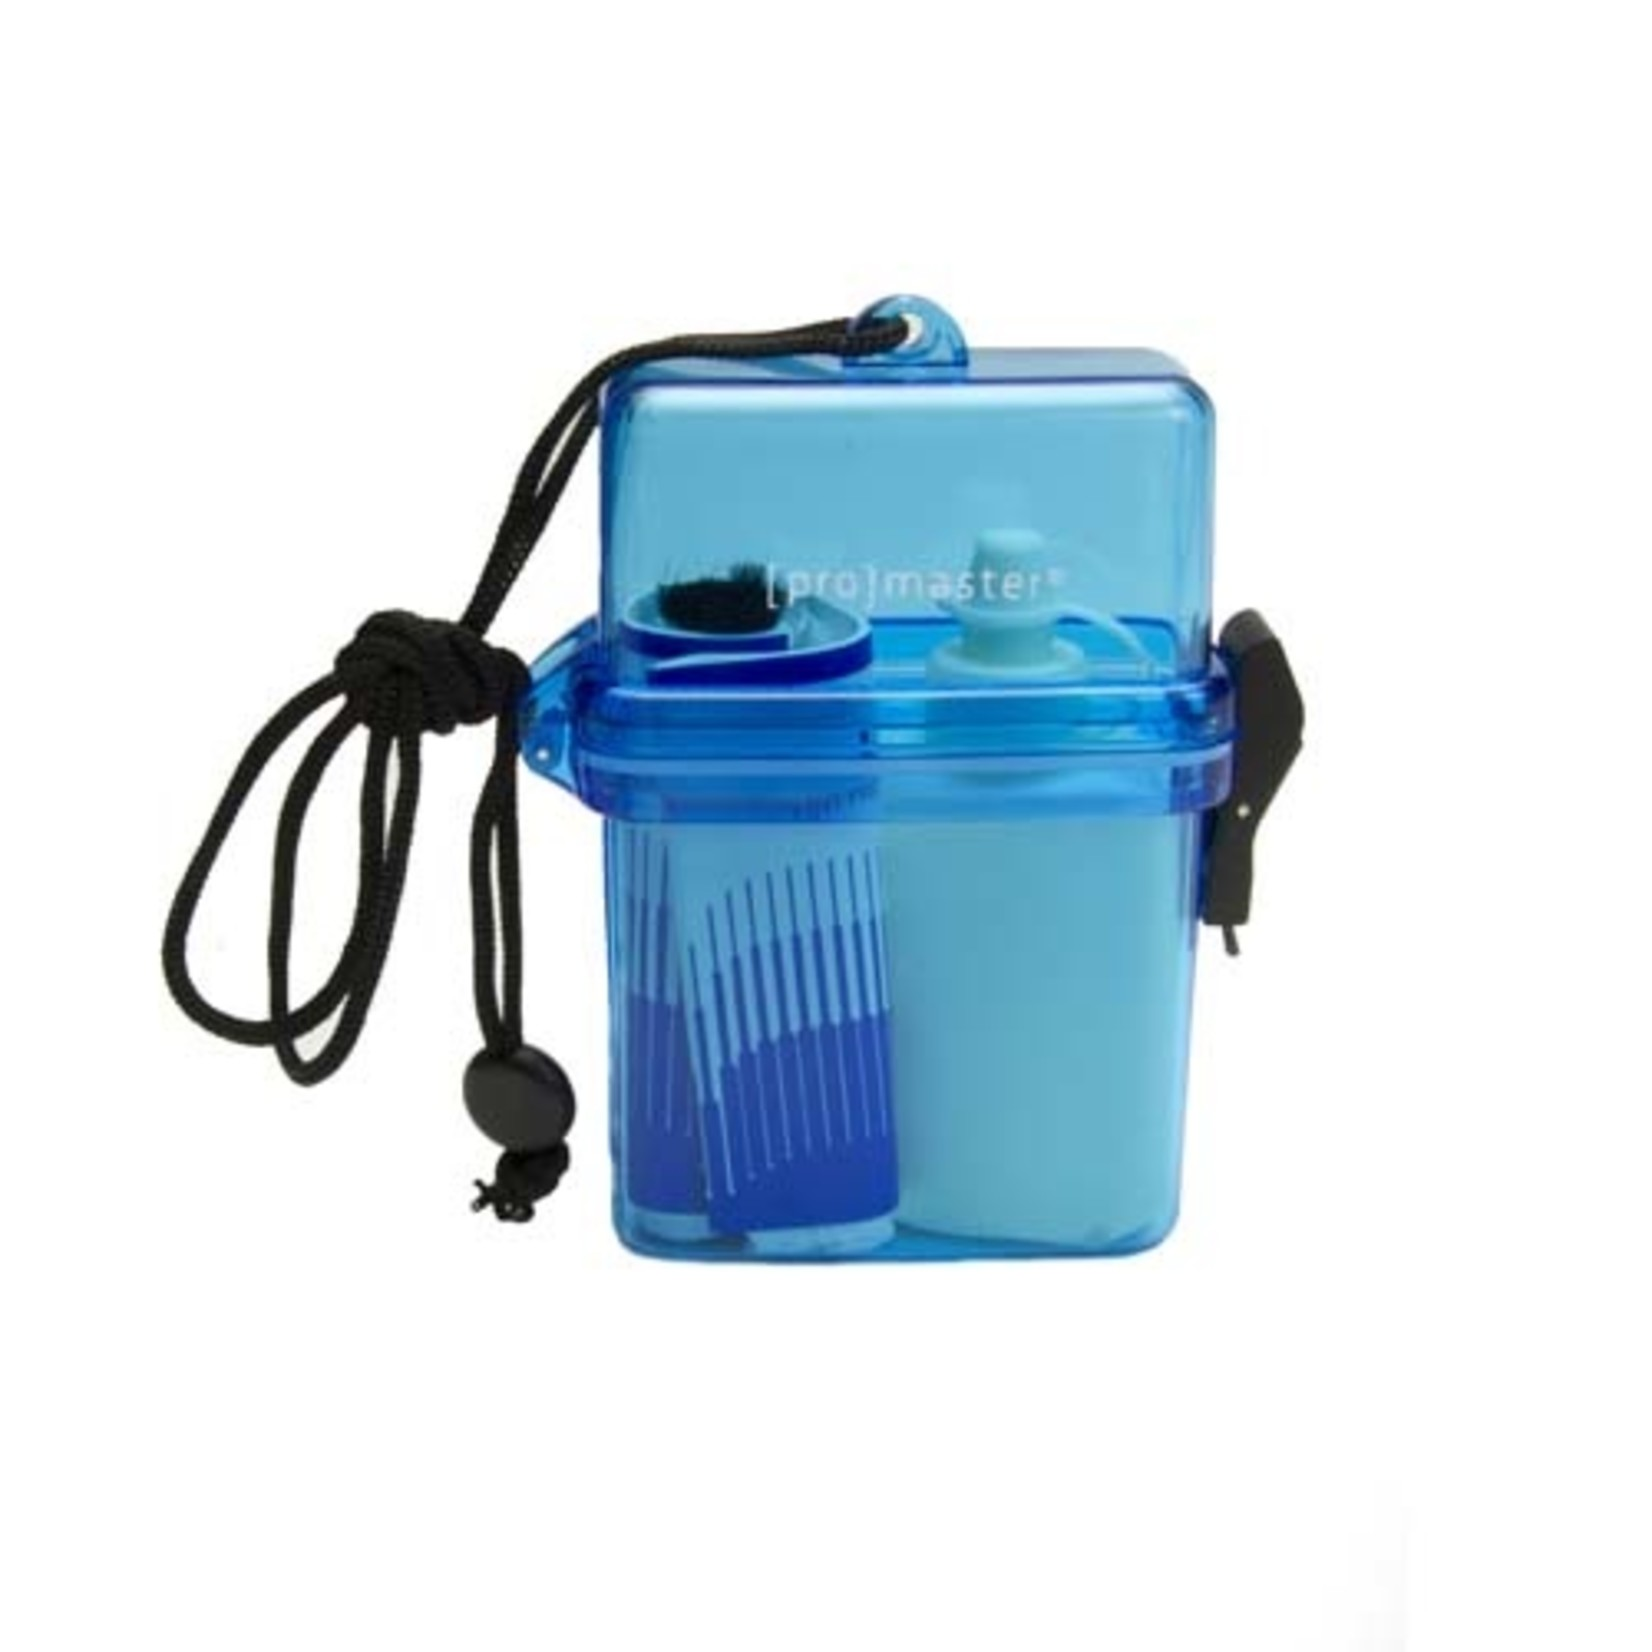 ProMaster Deluxe Camera Care Kit